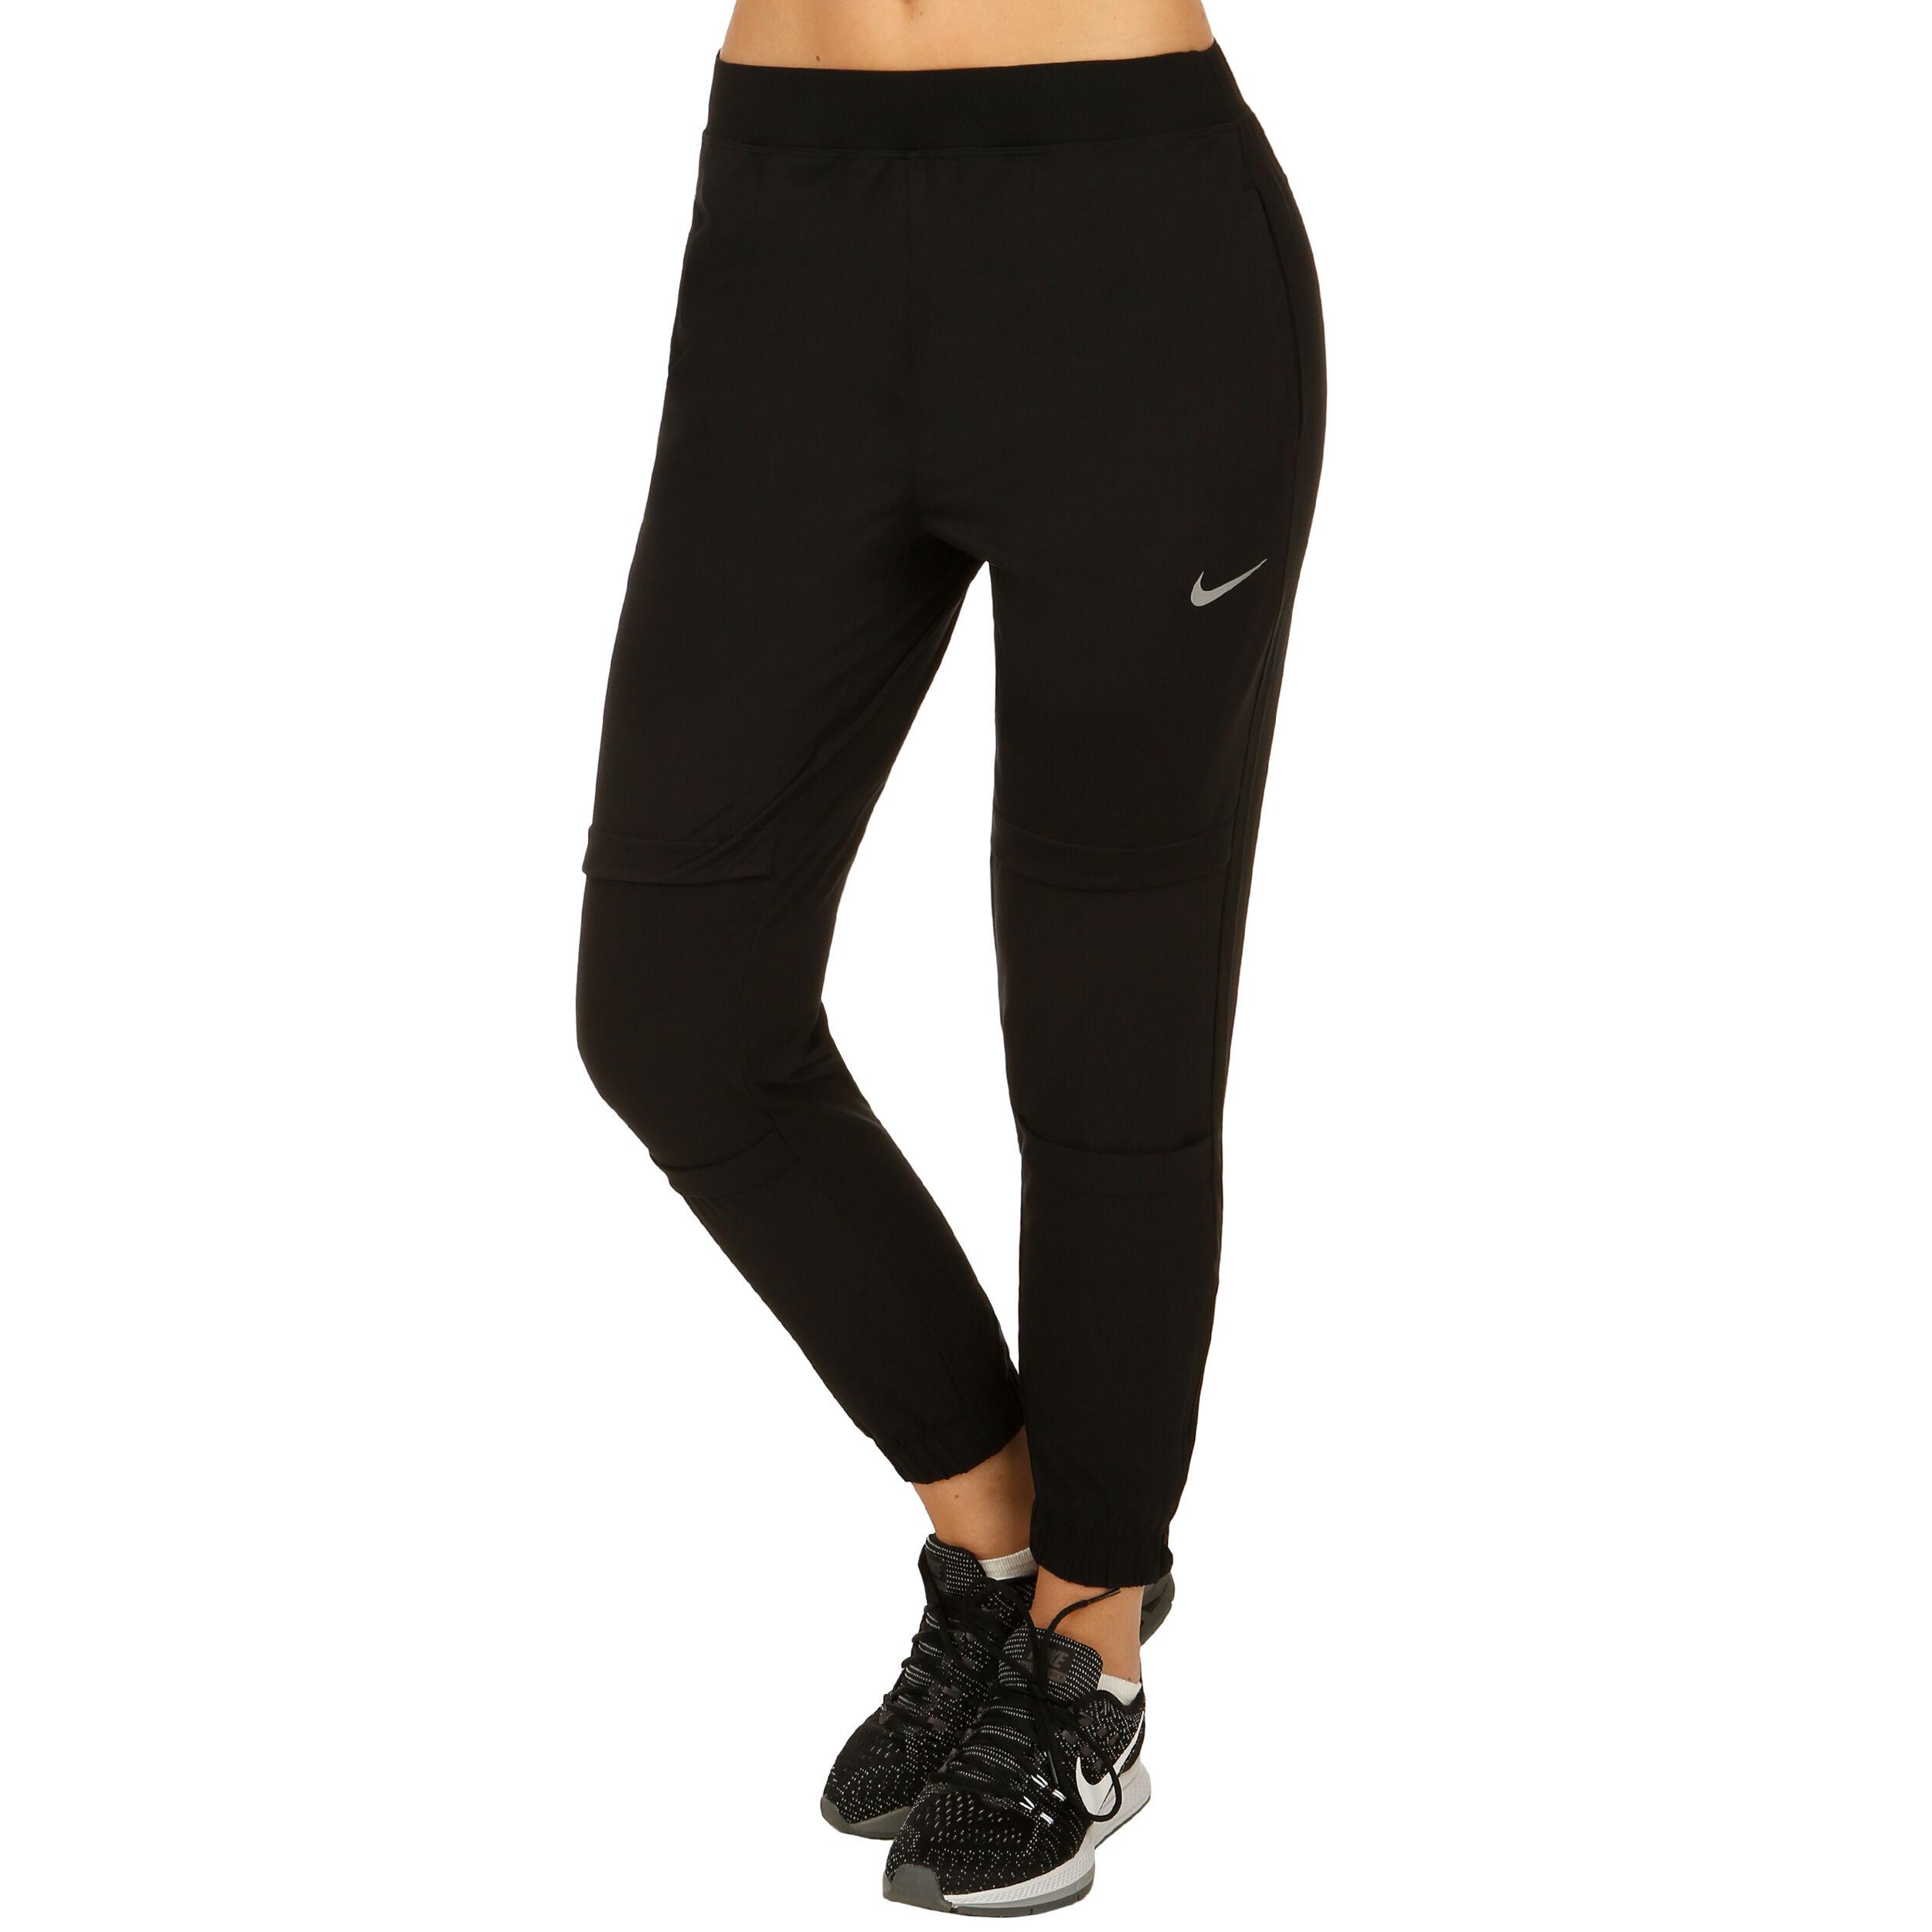 Nike Shield Swift Laufhose Damen Schwarz, Grau online